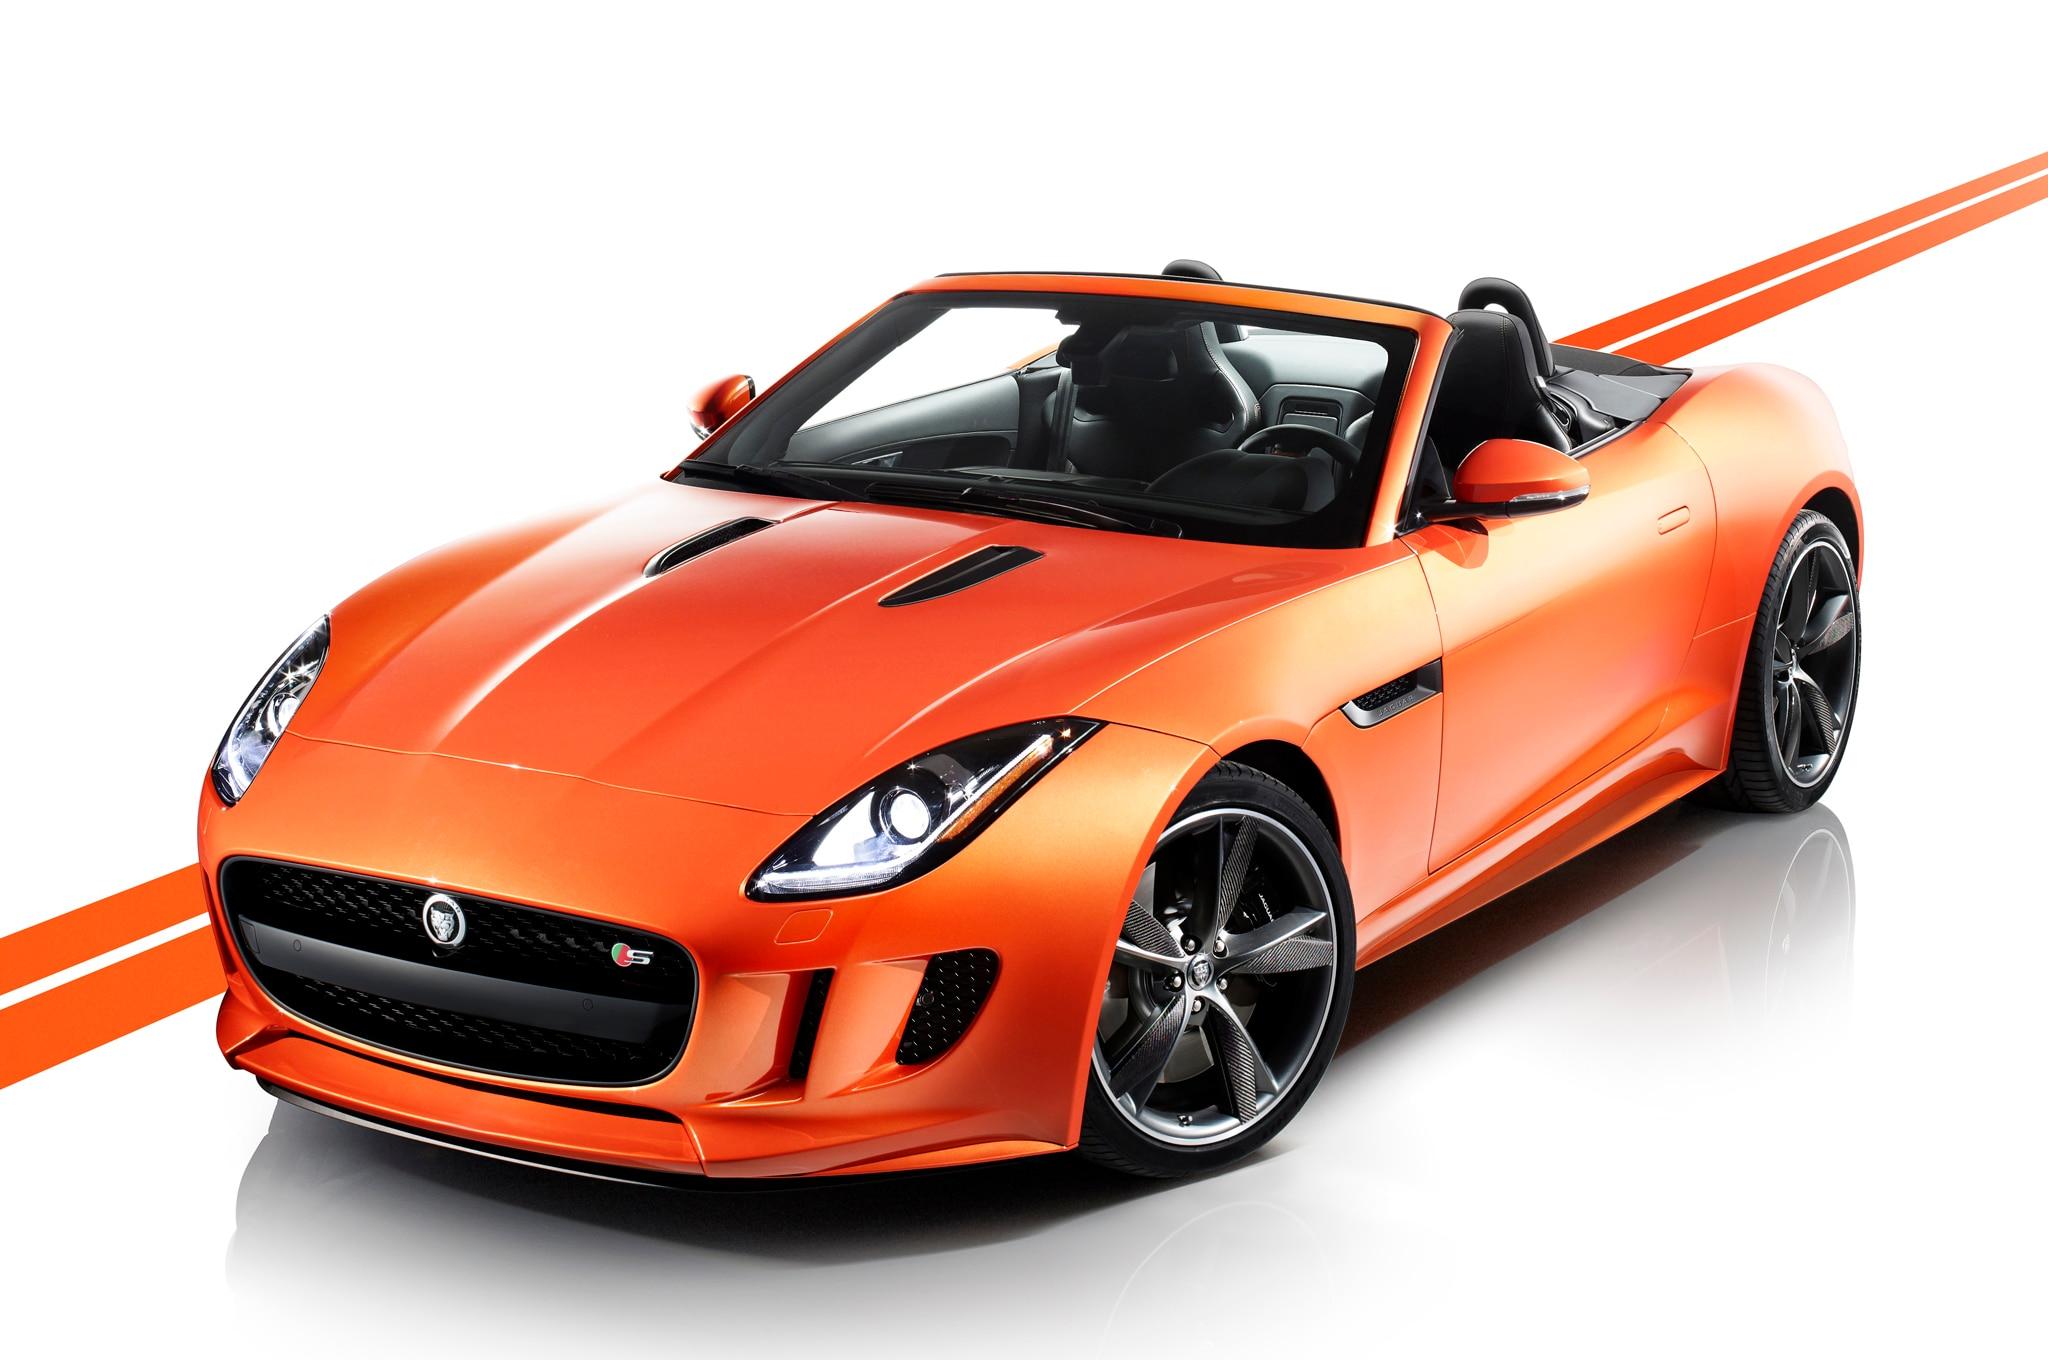 2014 Jaguar F Type Front Three Quarters1